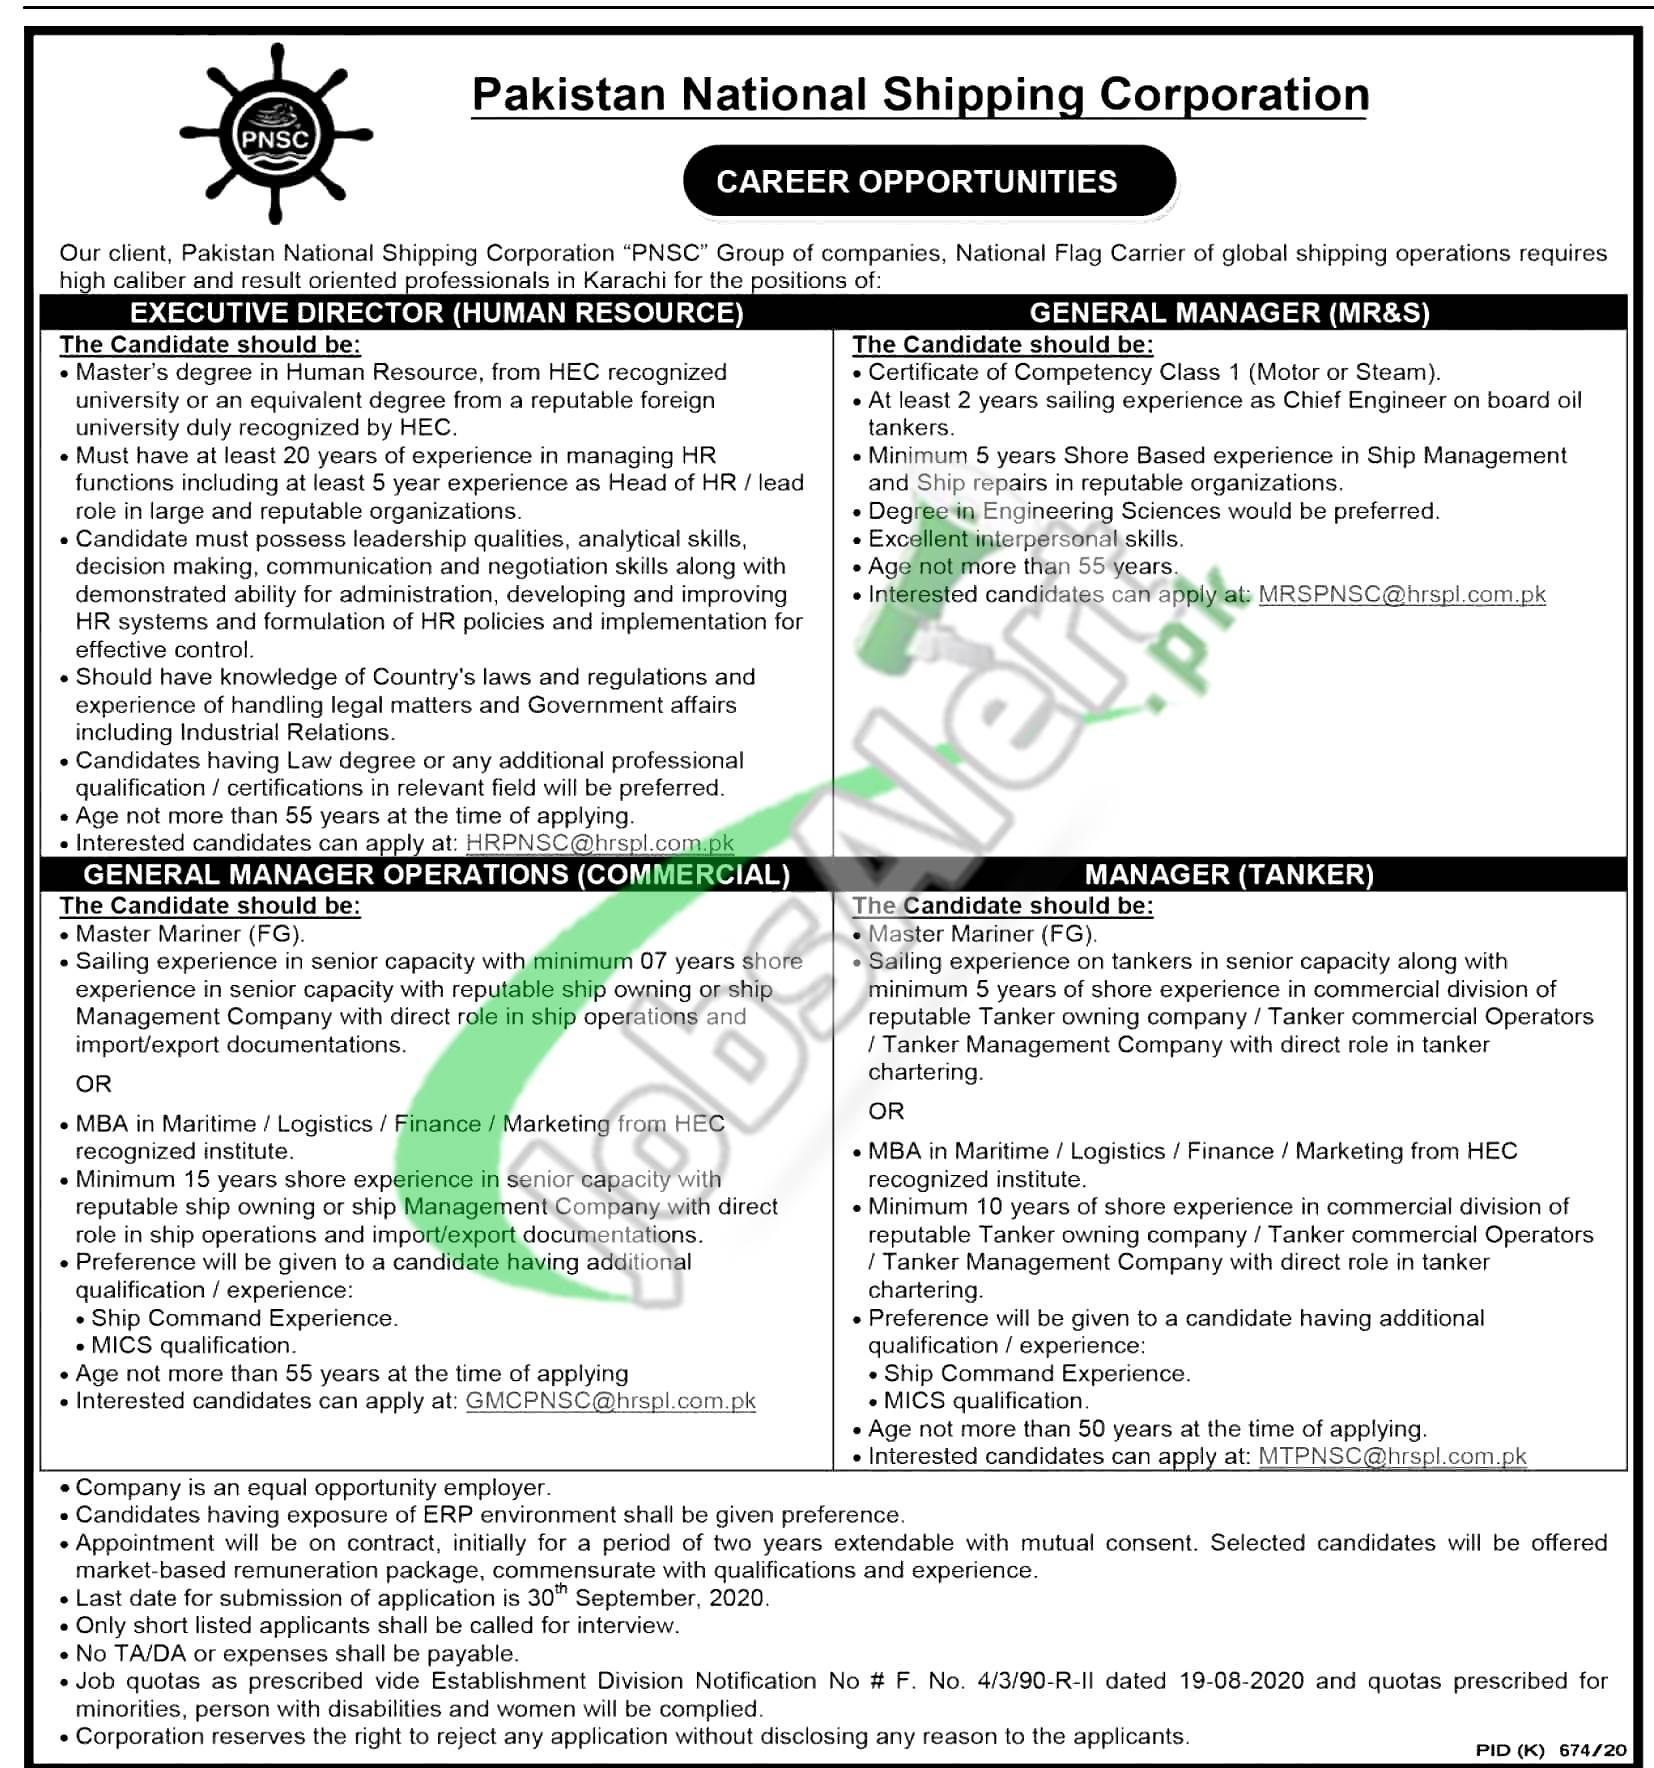 Pakistan National Shipping Corporation Jobs